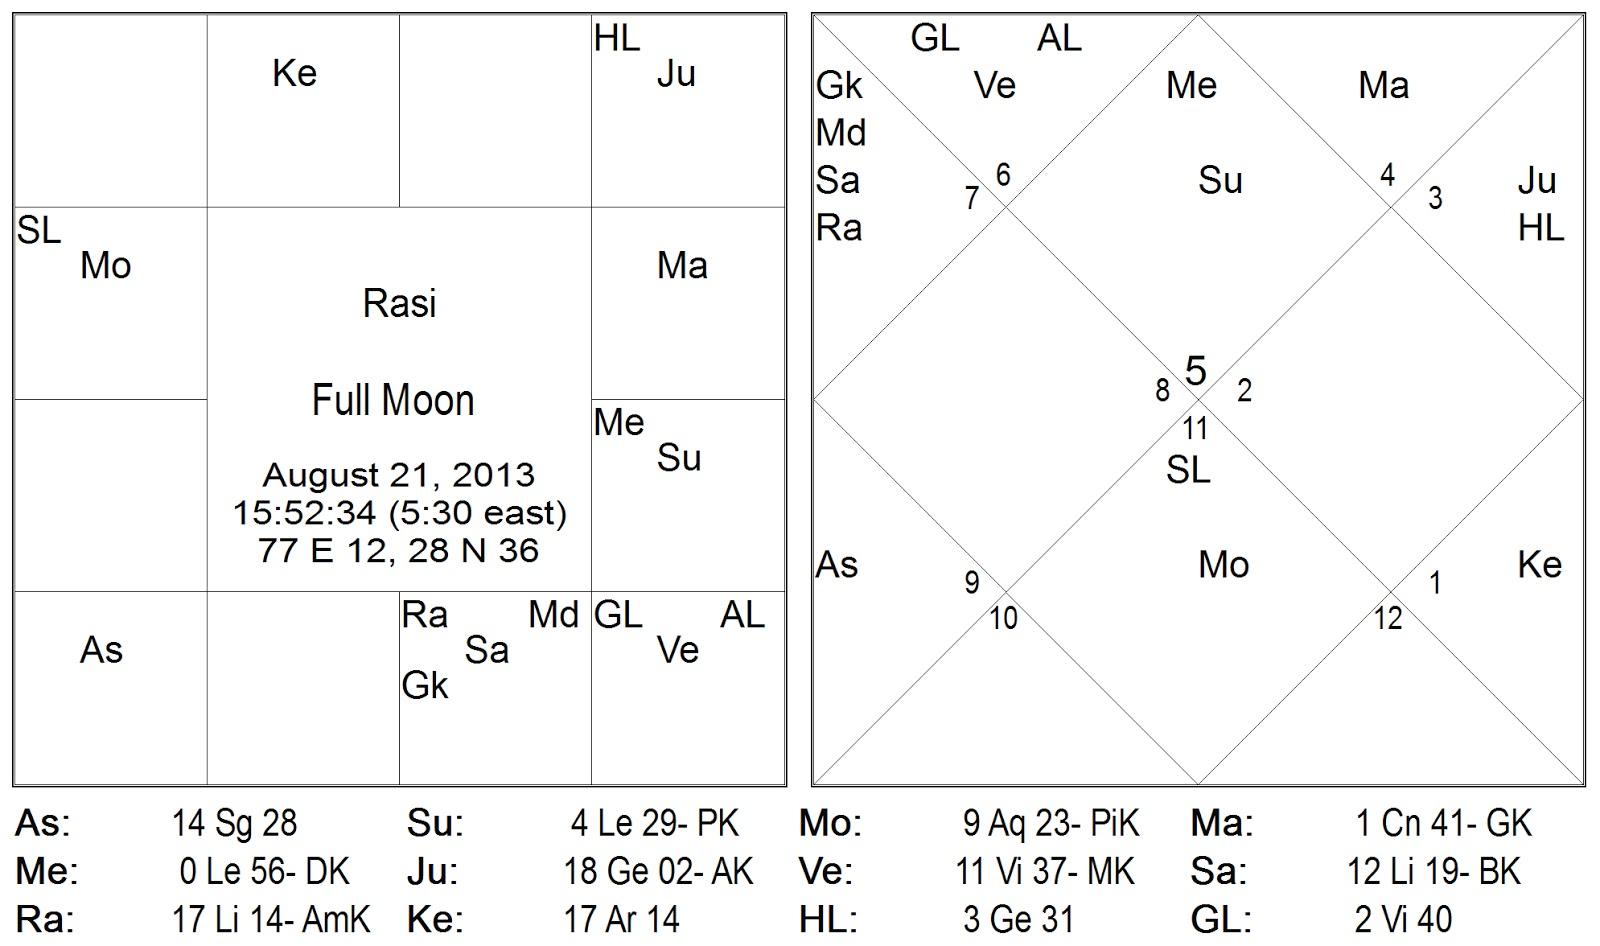 Horoscopes for the August 12222 Full Moon in Aquarius